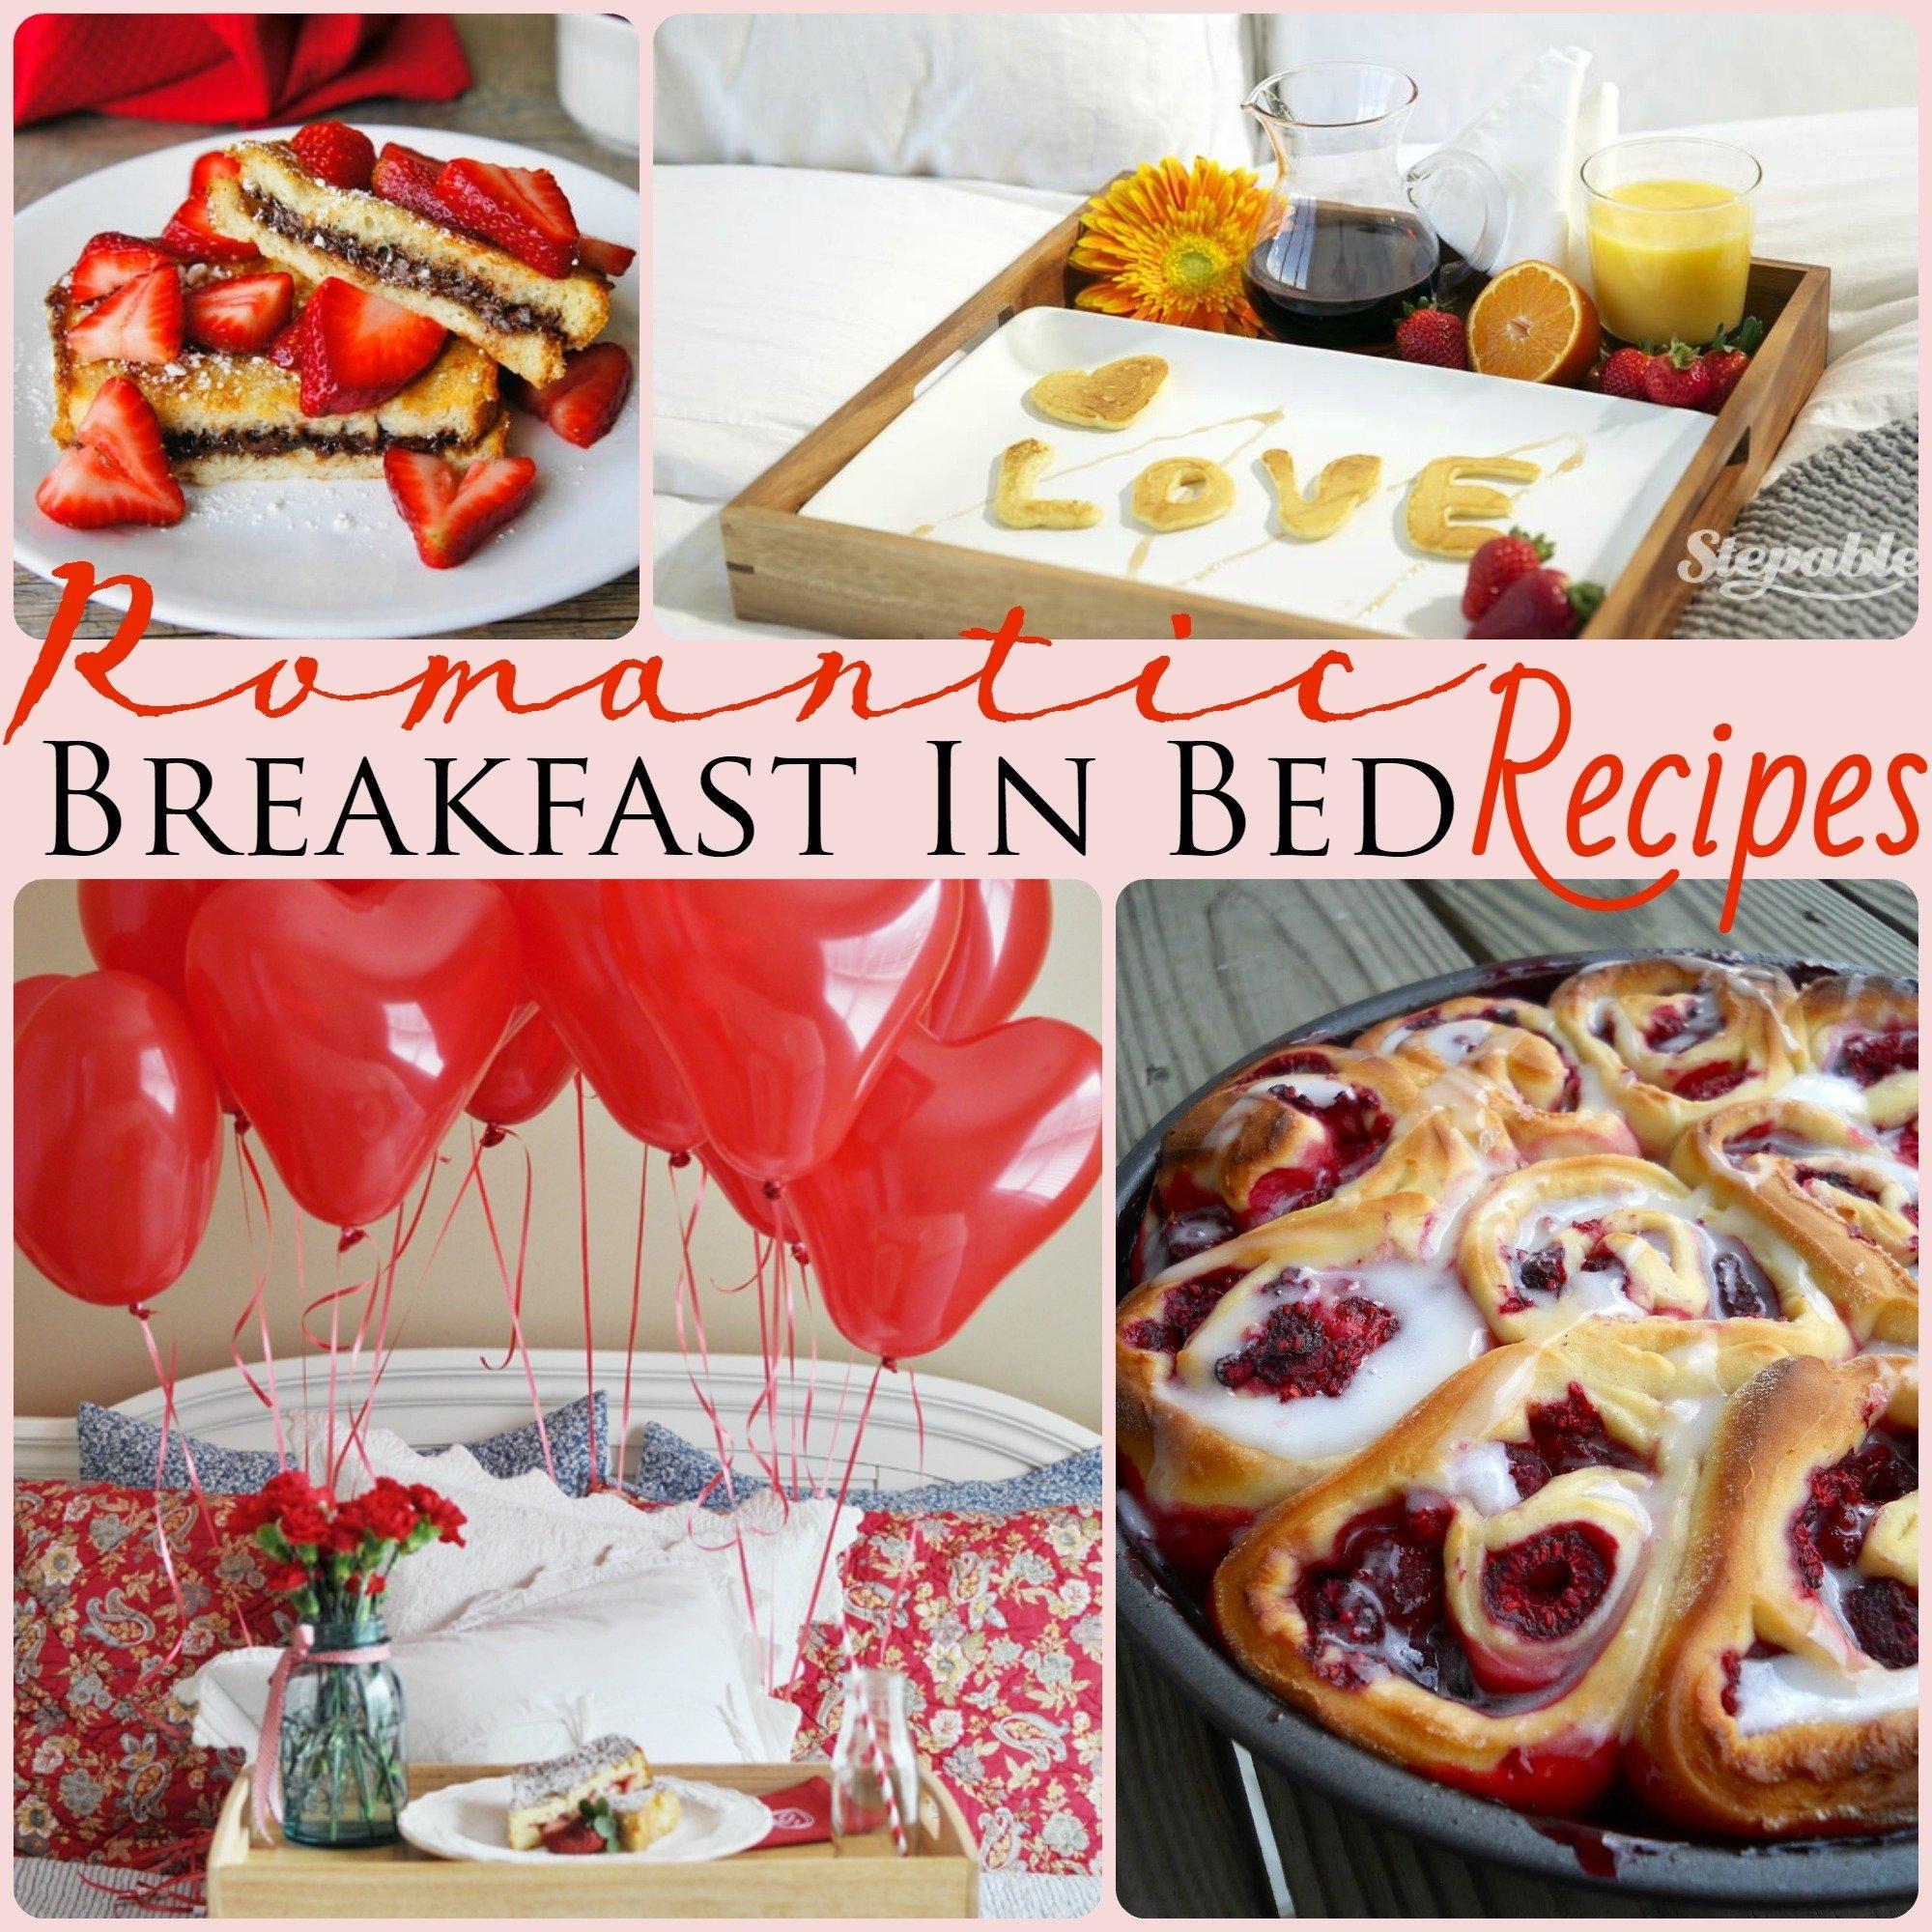 10 Gorgeous Romantic Breakfast In Bed Ideas 21 romantic breakfast in bed recipes piece of home 1 2020